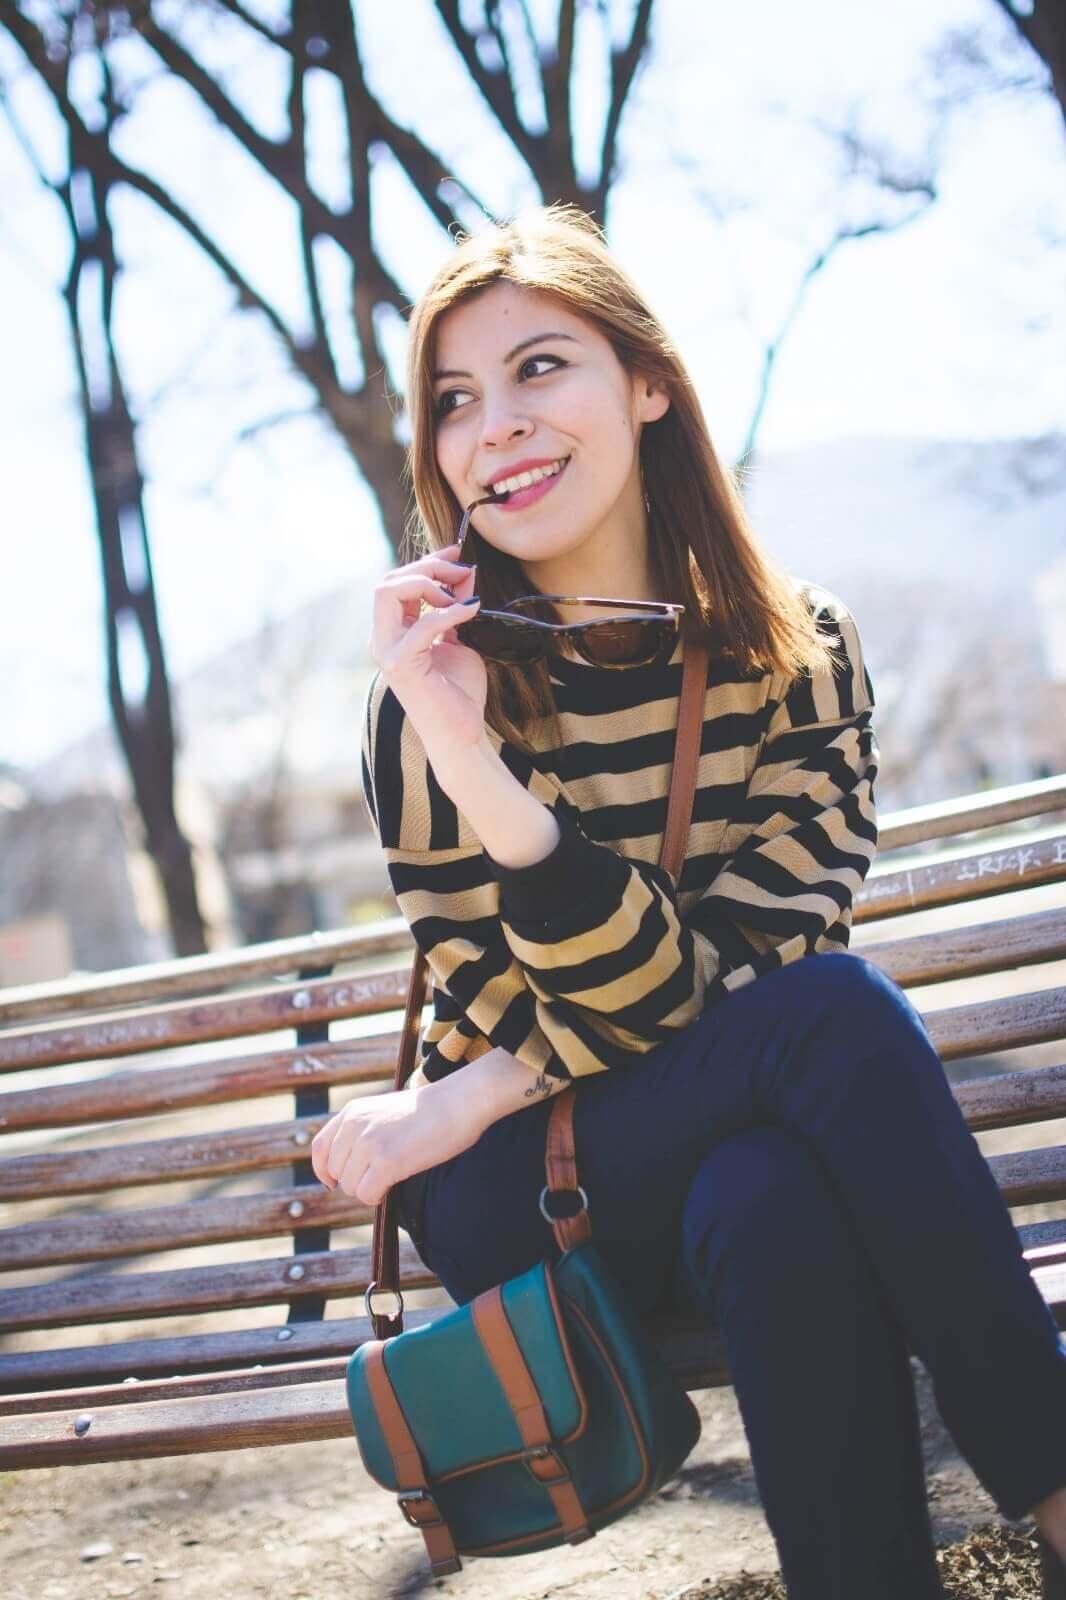 sammydress-block-heel-sandals-leopard-frame-light-brown-sammydress-sunglasses-deborah-ferrero-style-by-deb-streetstyle-salta-striped-sweater-fall2016-trends10